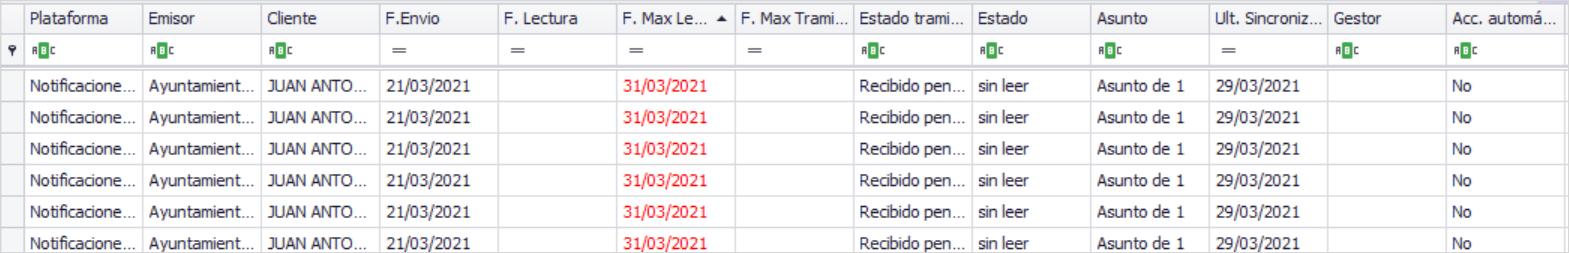 notificaciones fecha maxima lectura